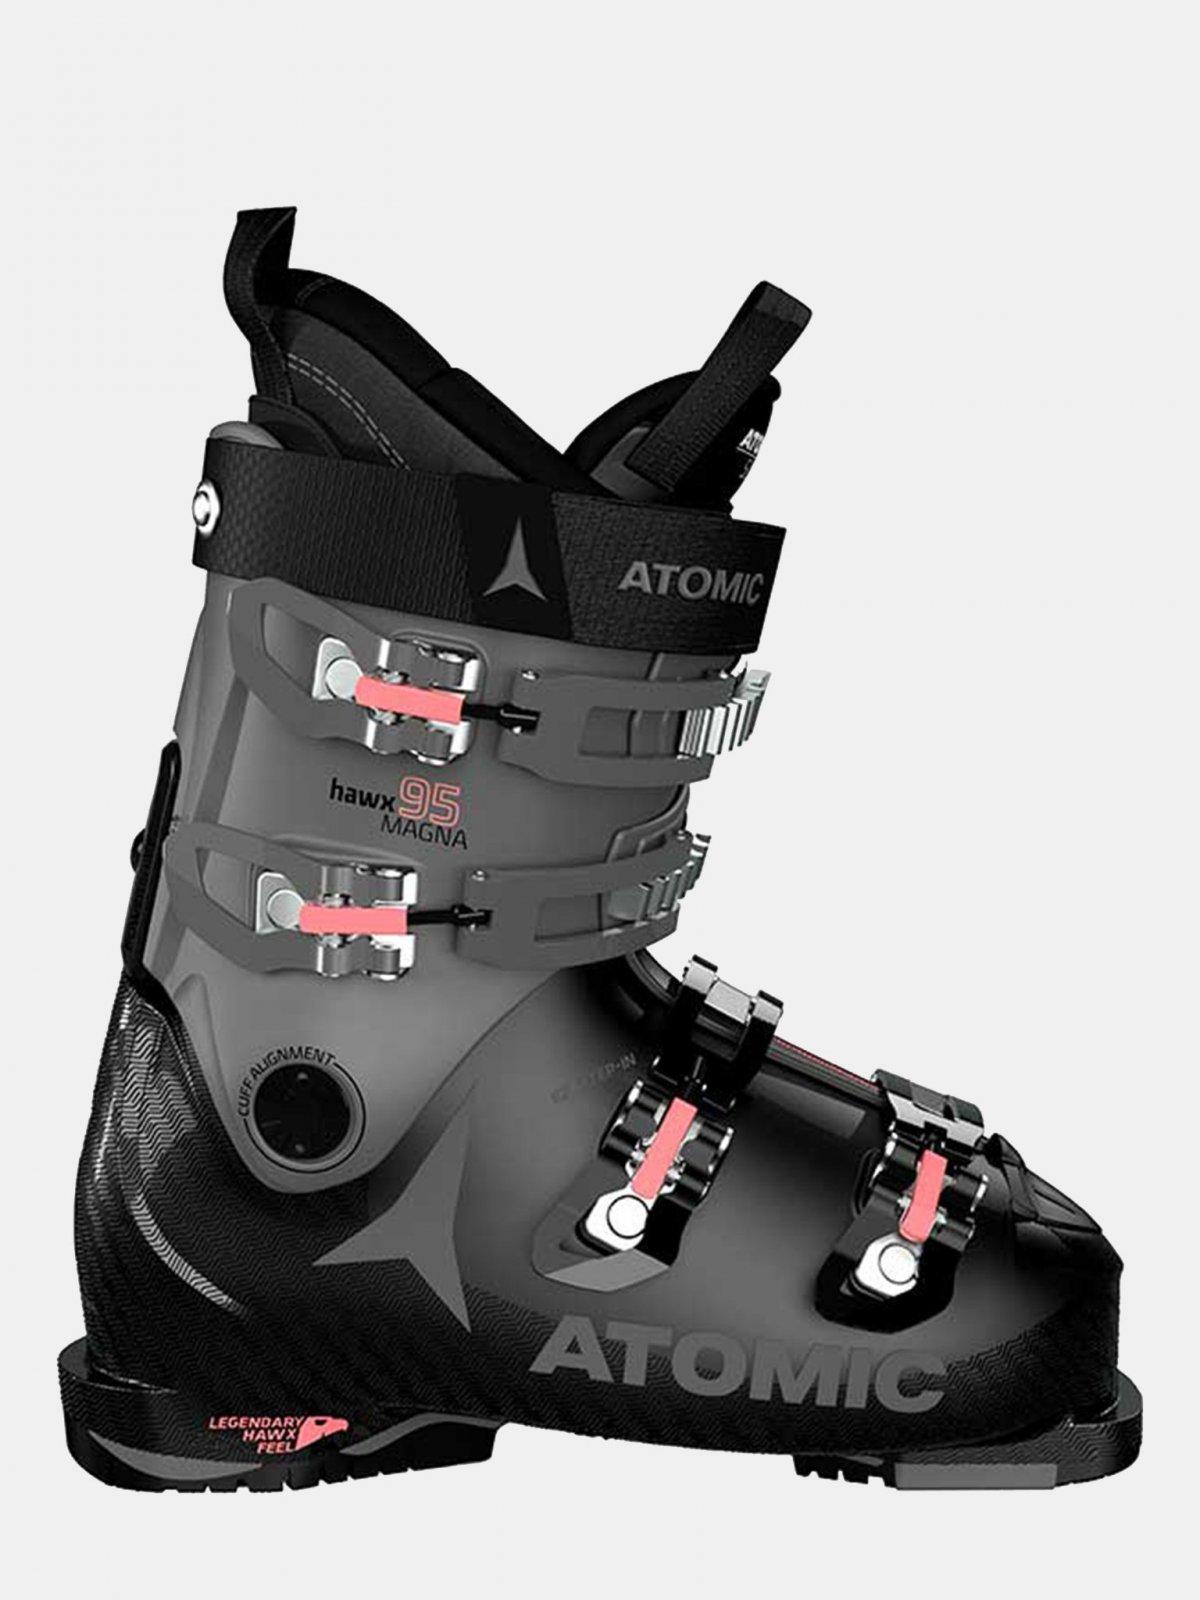 2021 Atomic Hawx Magna 95 S Women's Ski Boots